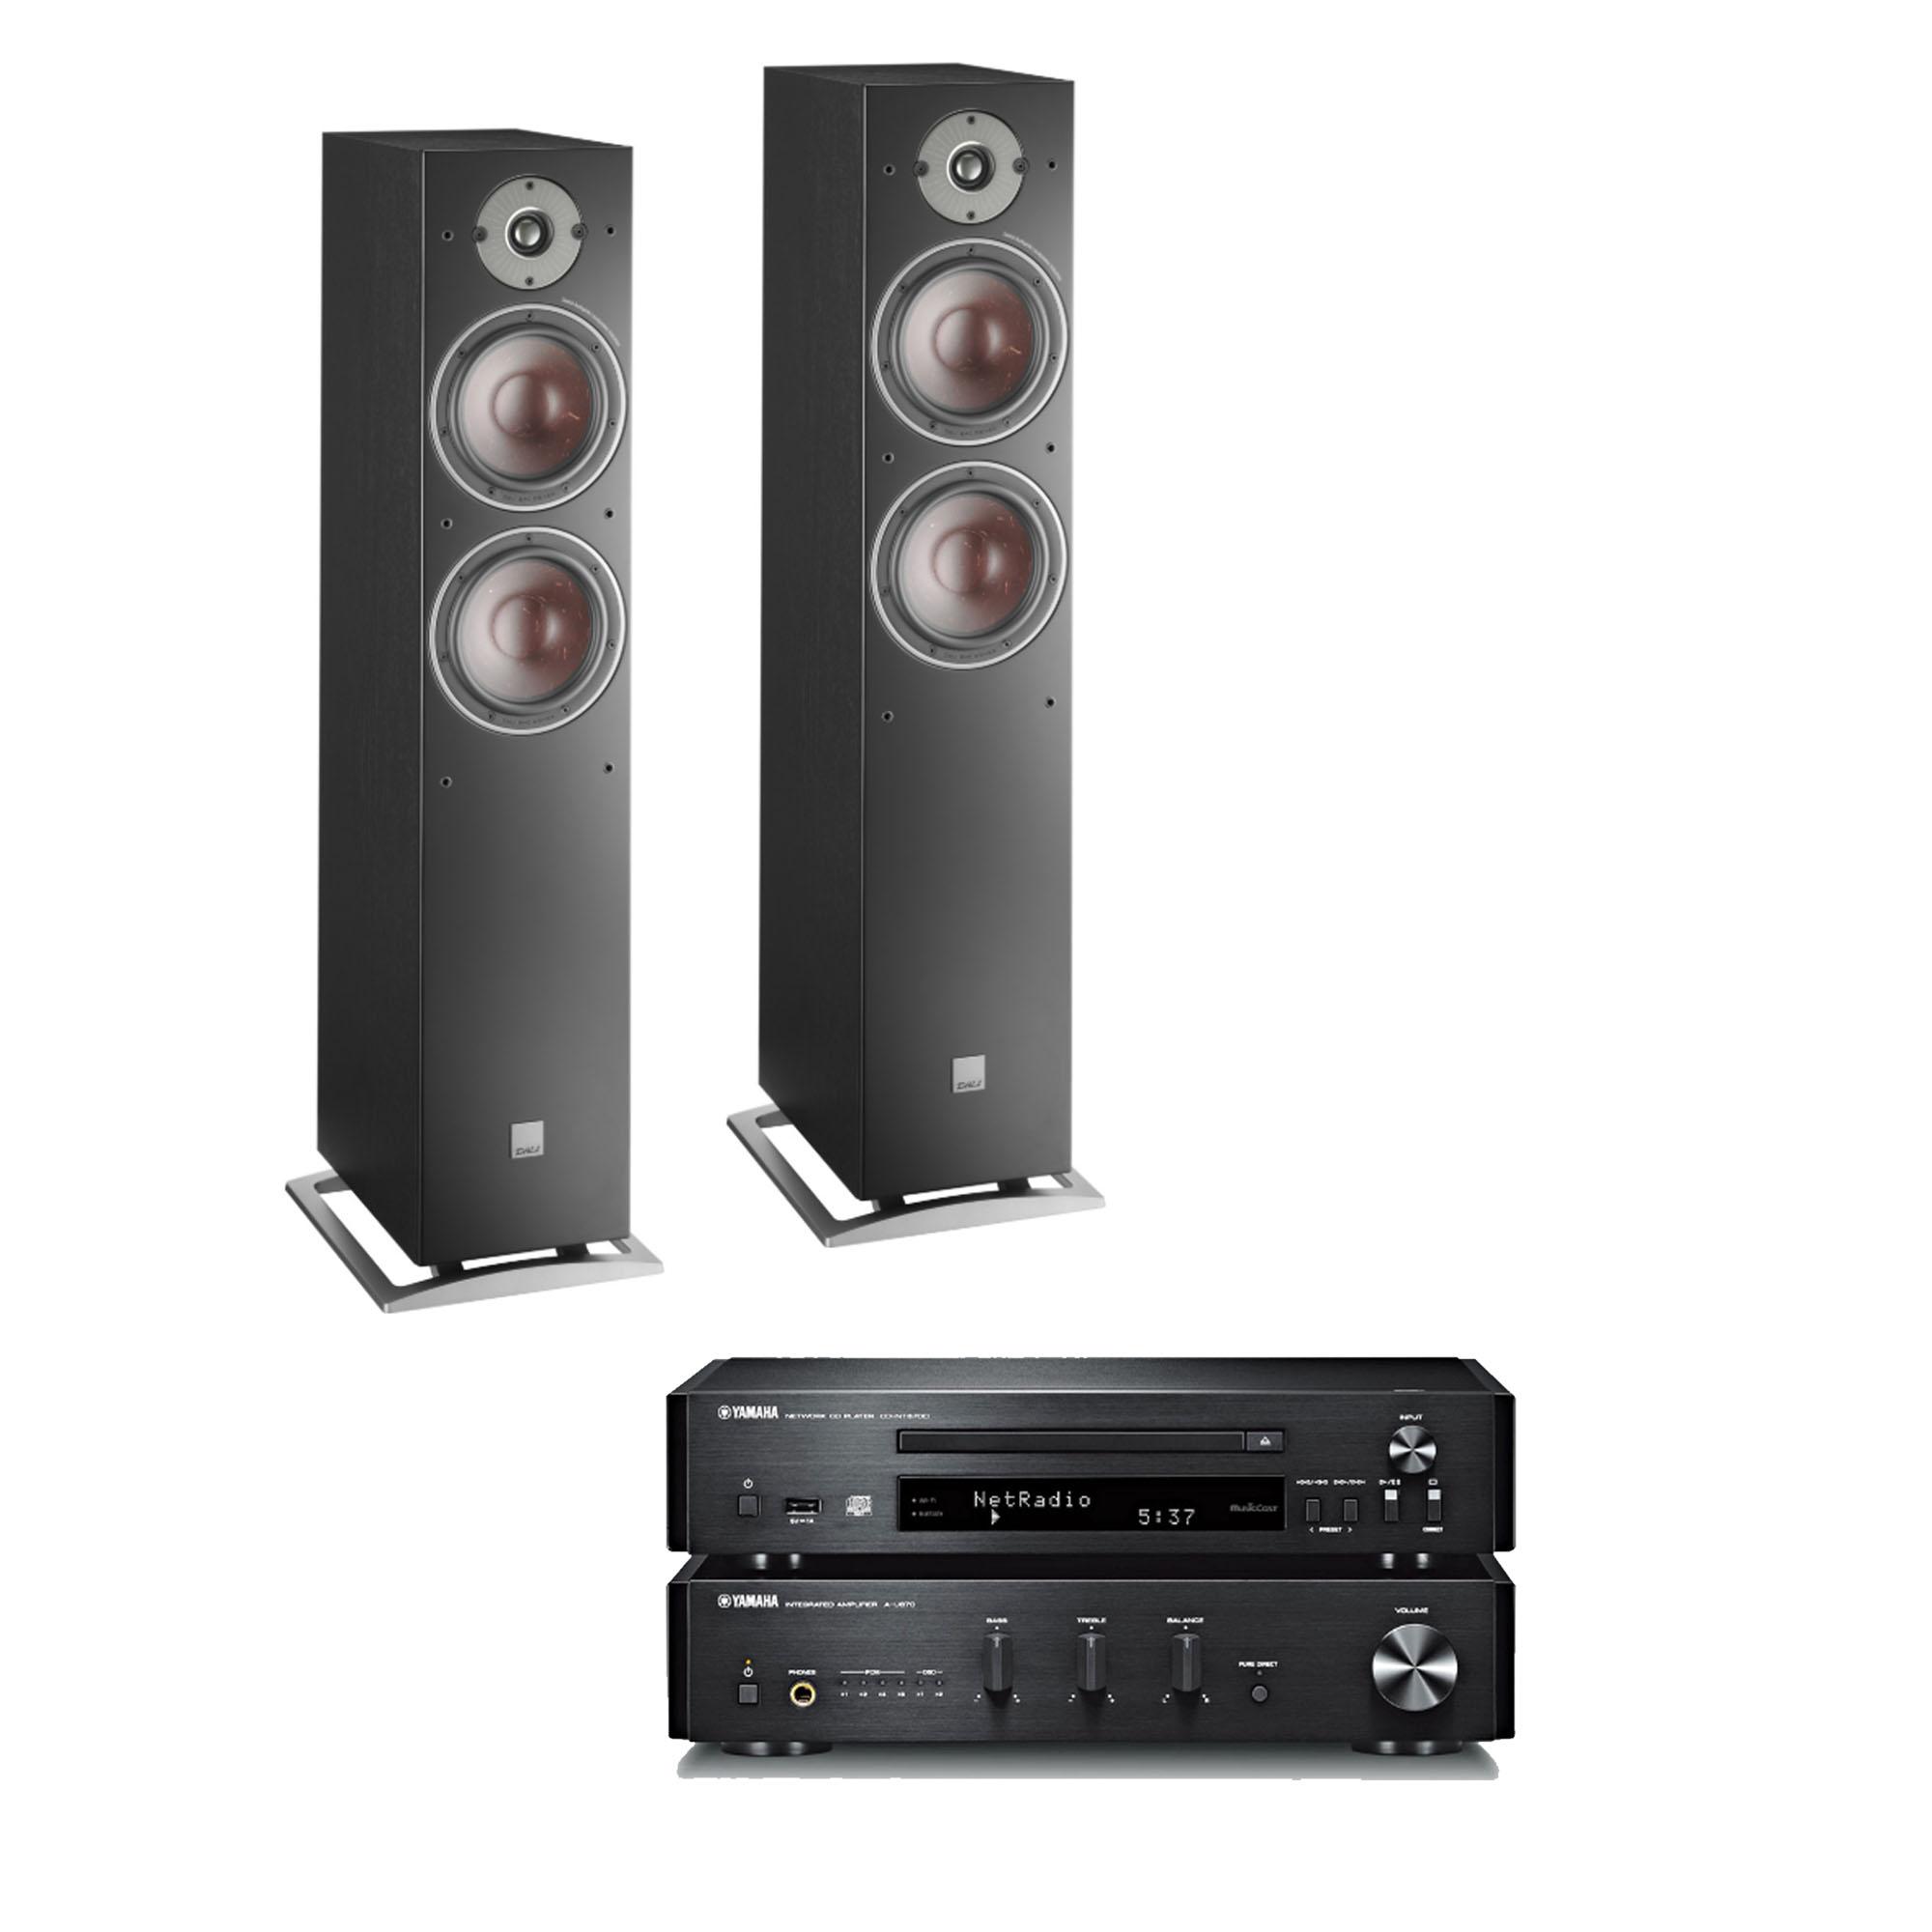 Yamaha MCR-N670 DAB Microanlage + Dali Oberon 7 schwarz ( DAB/UKW, Internetradio, CD-Player, Air-Play )